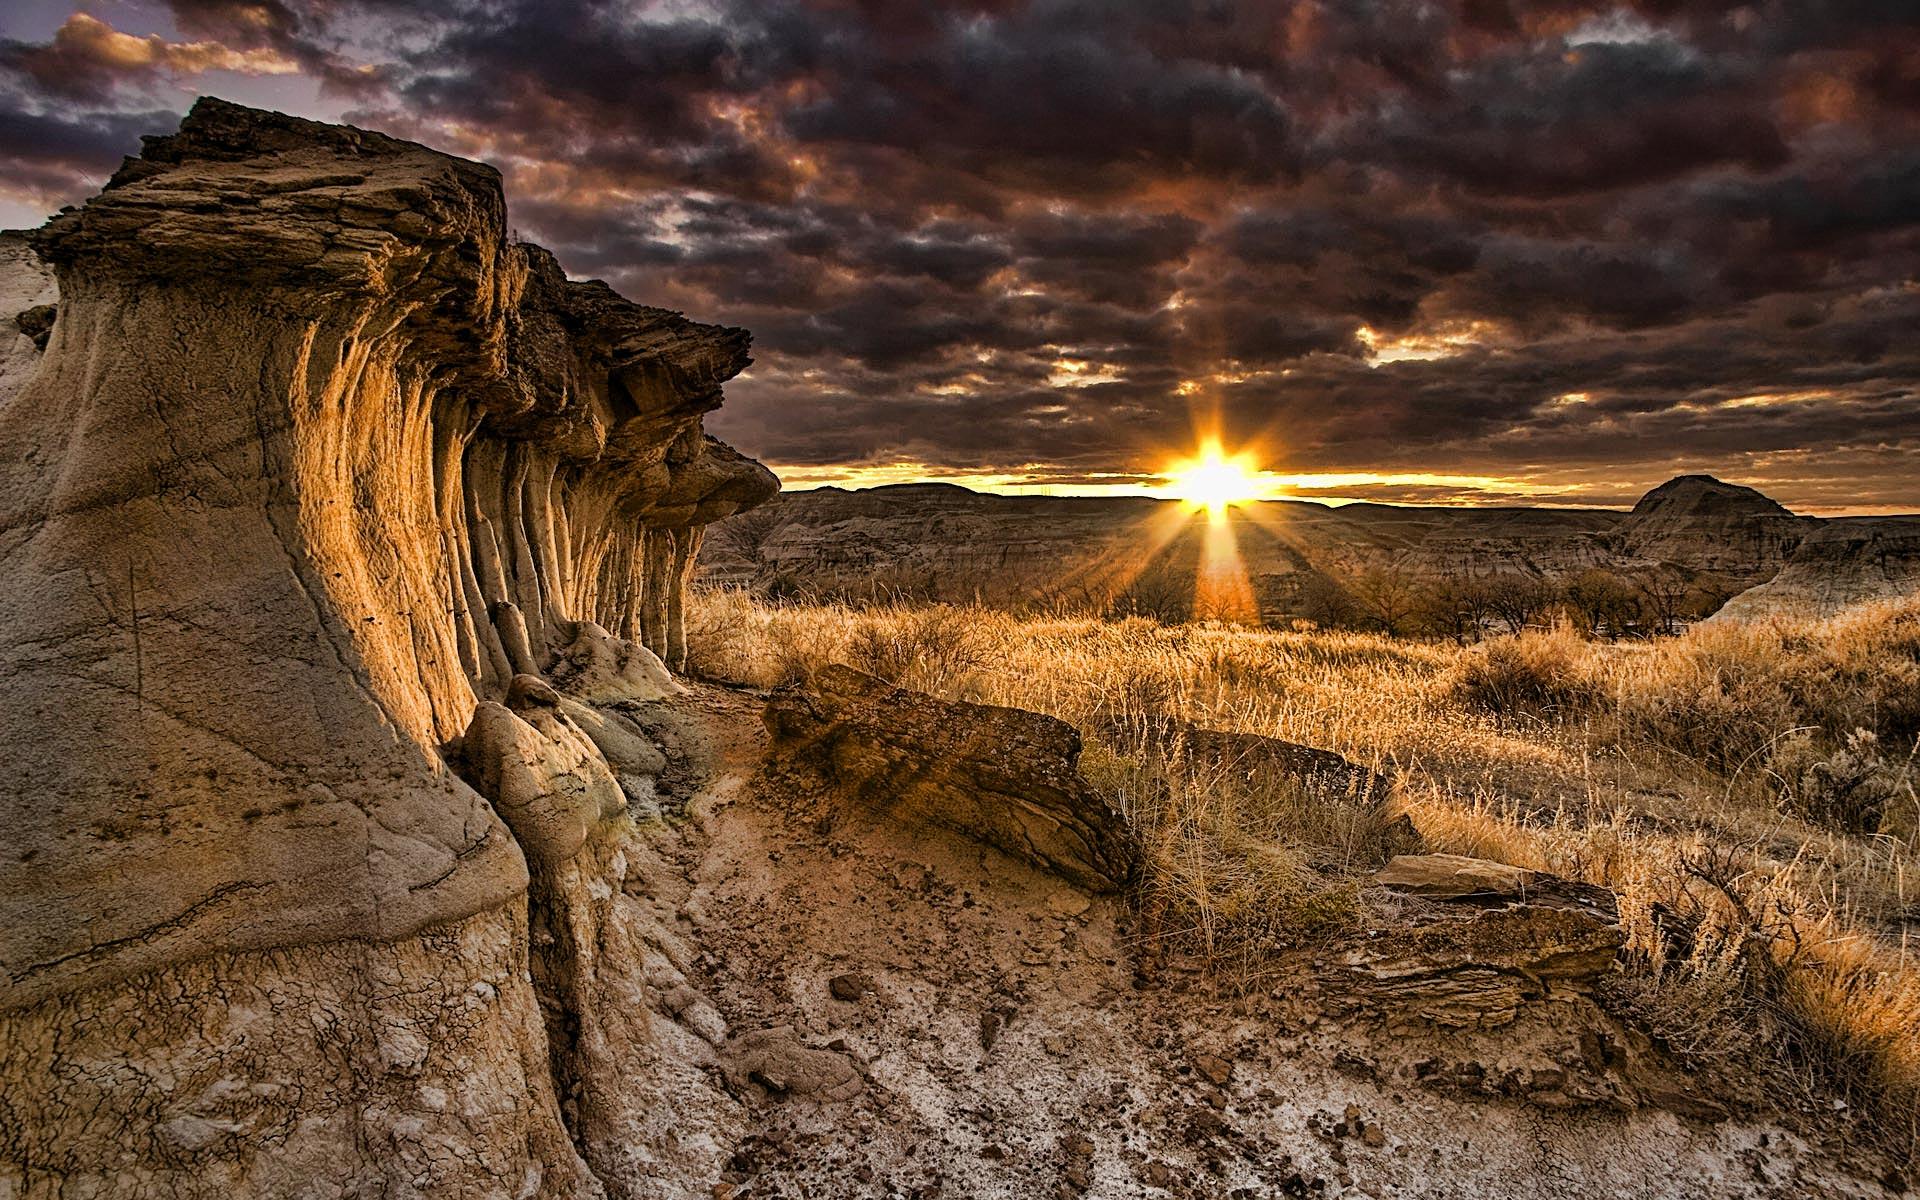 Amazing-Canyon-Sunrise-Widescreen-Wallpaper.jpg